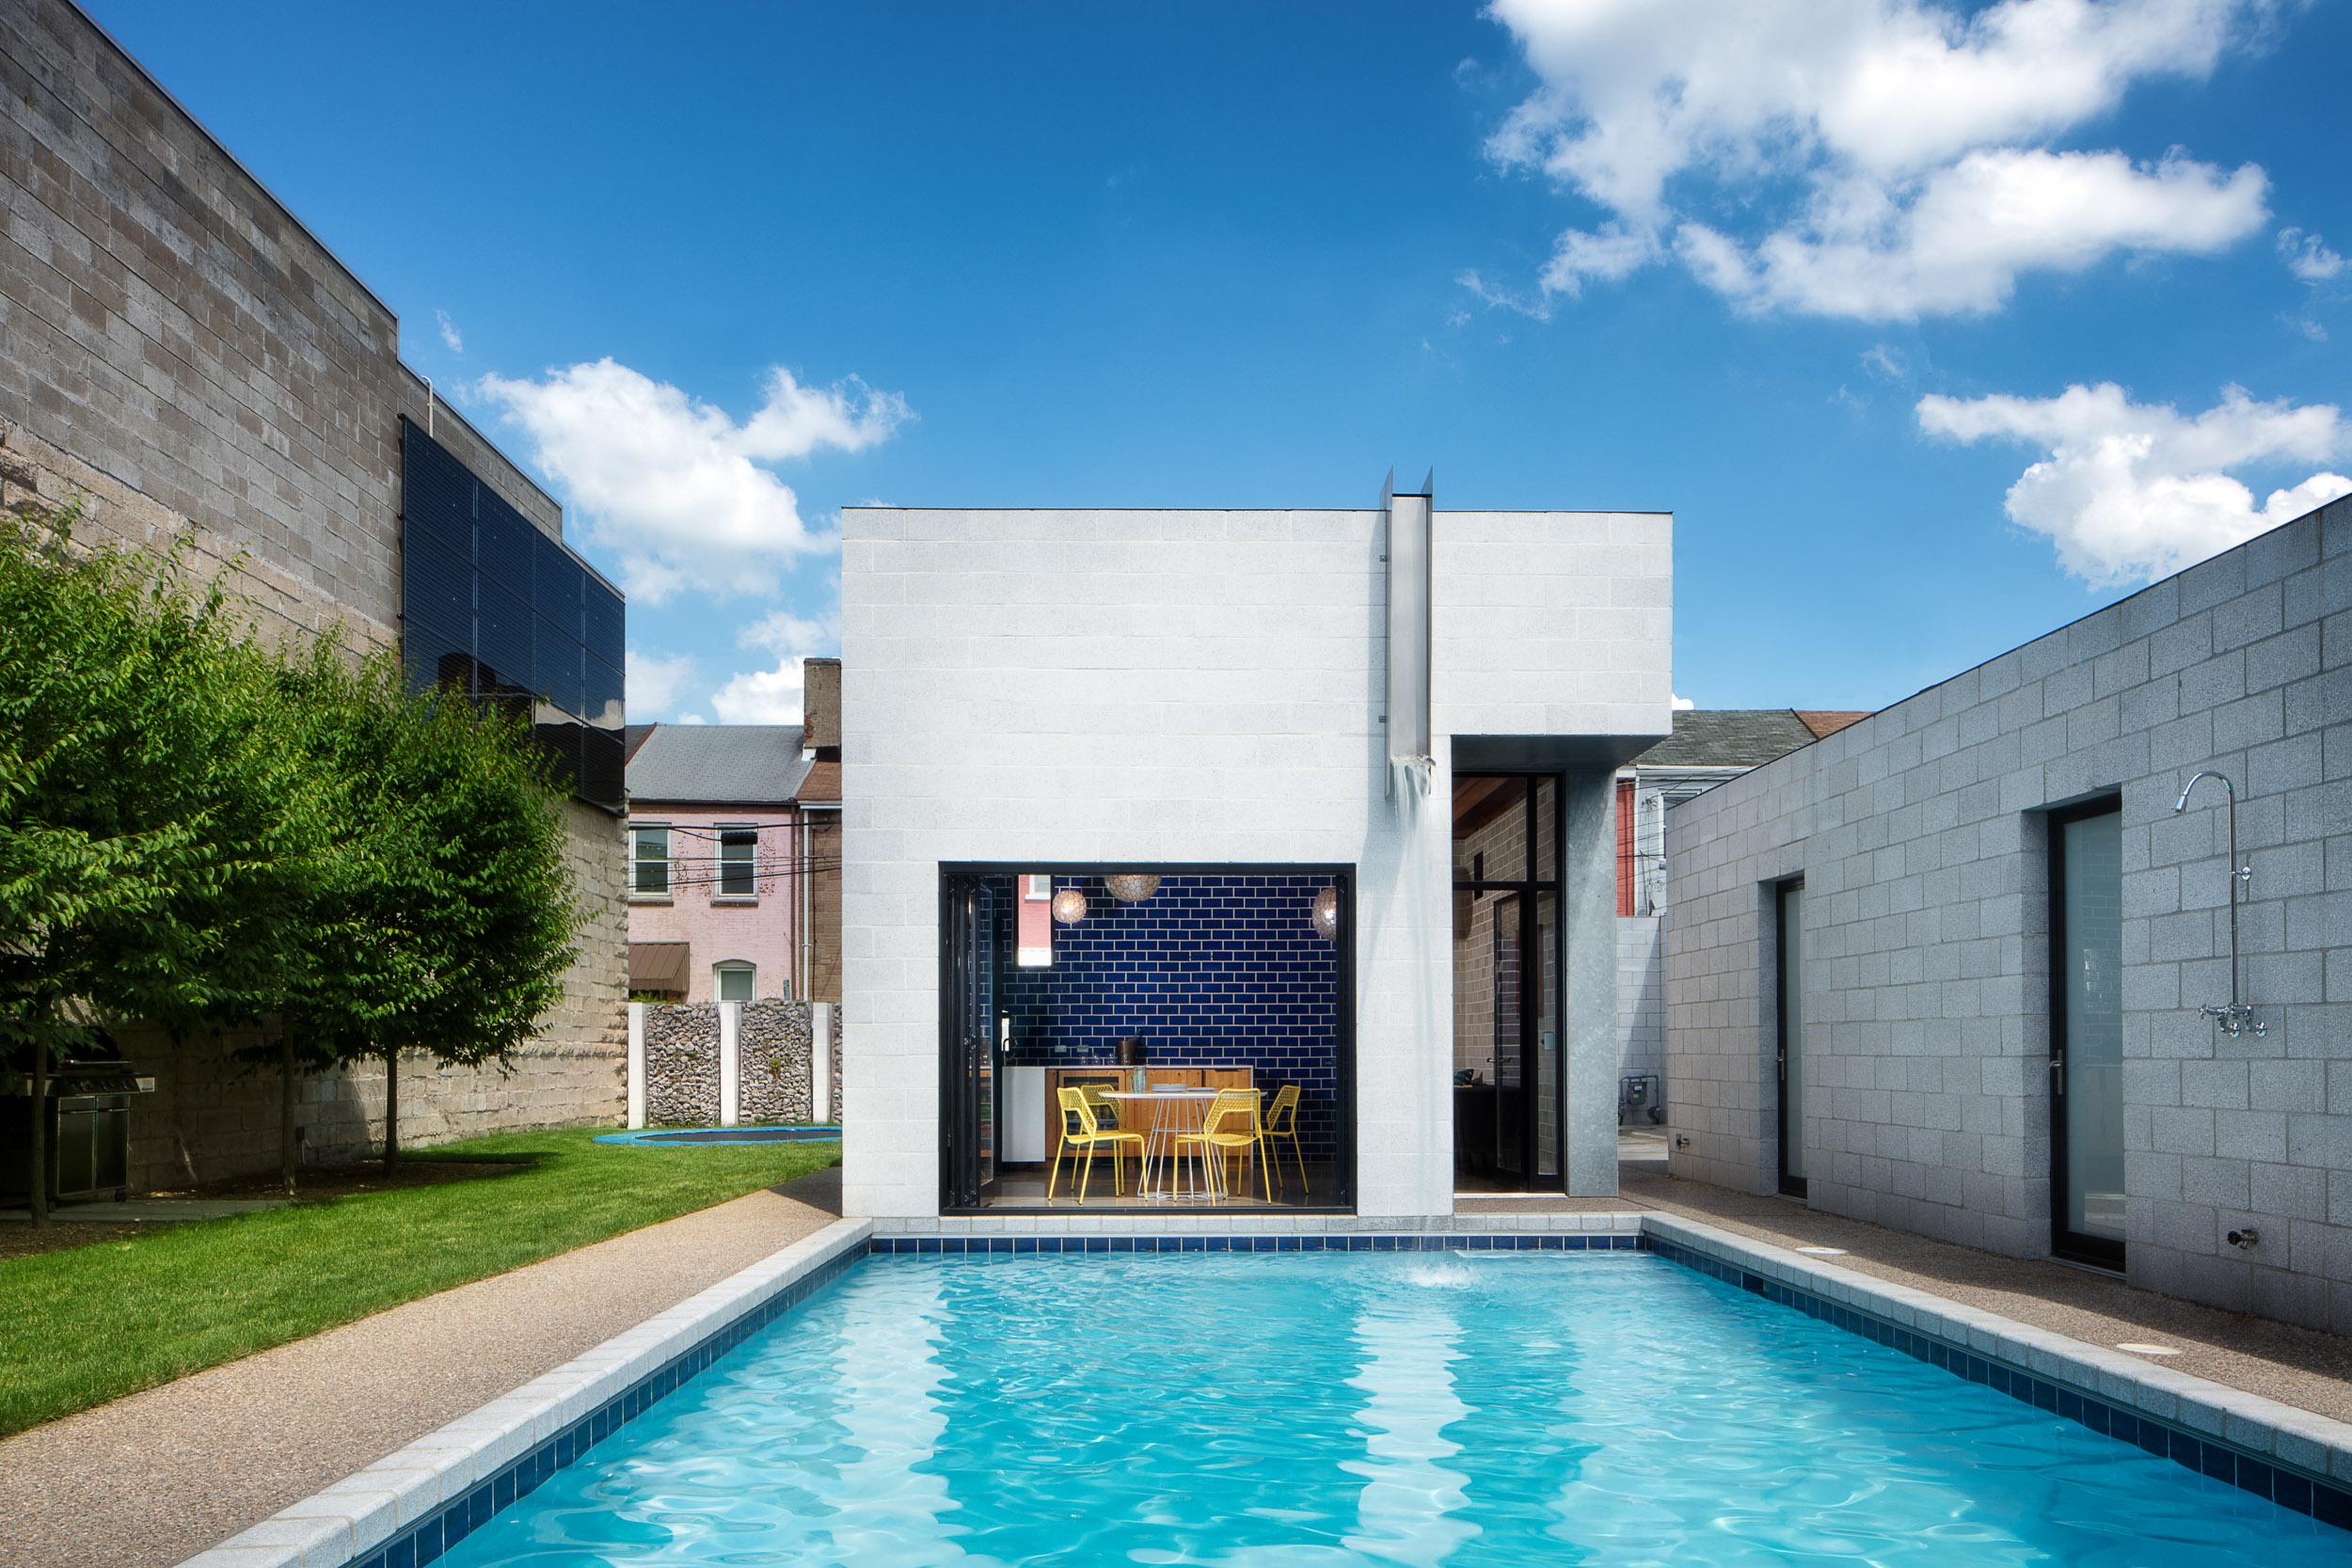 pool_pavilion_pittsburgh_design_poolhouse-8.jpg